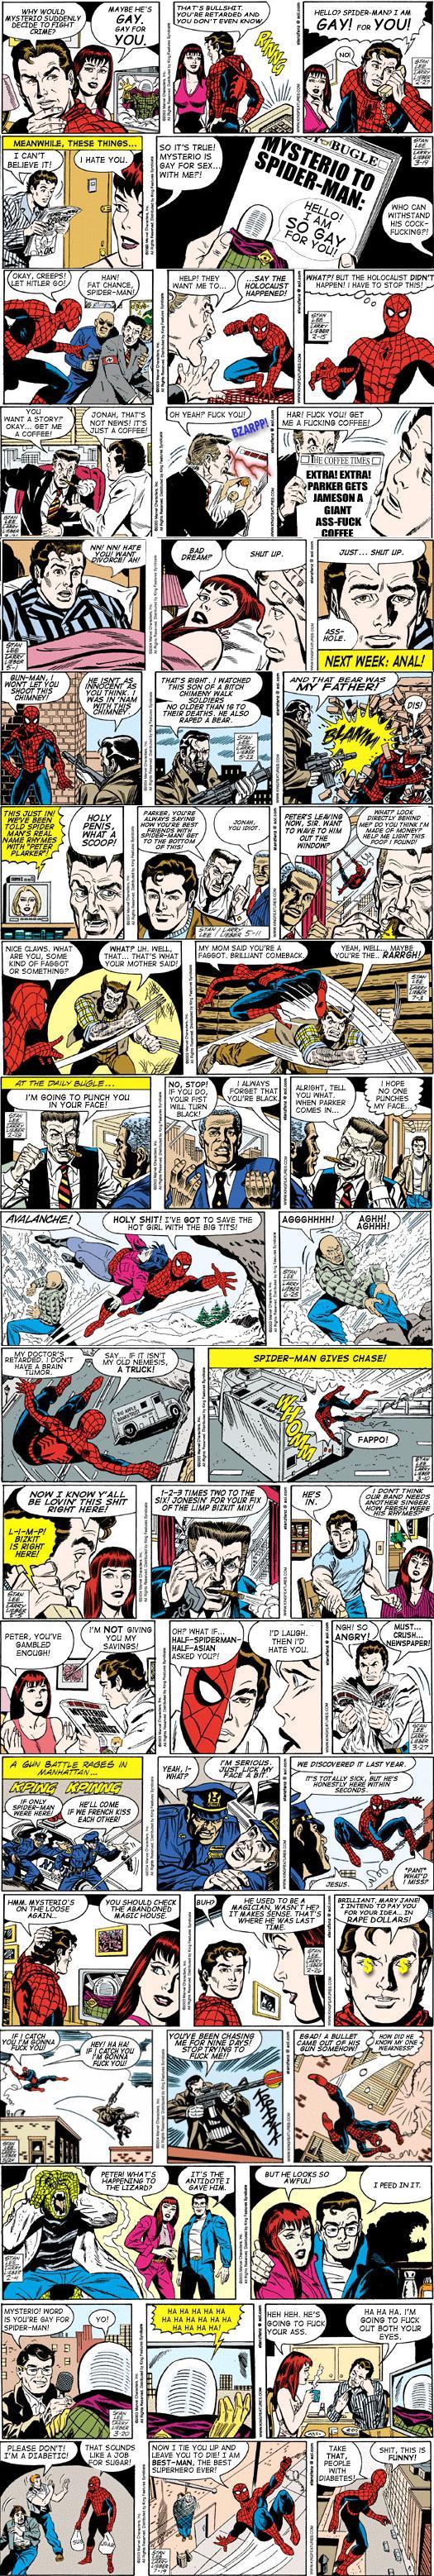 spiderman2wr.jpg